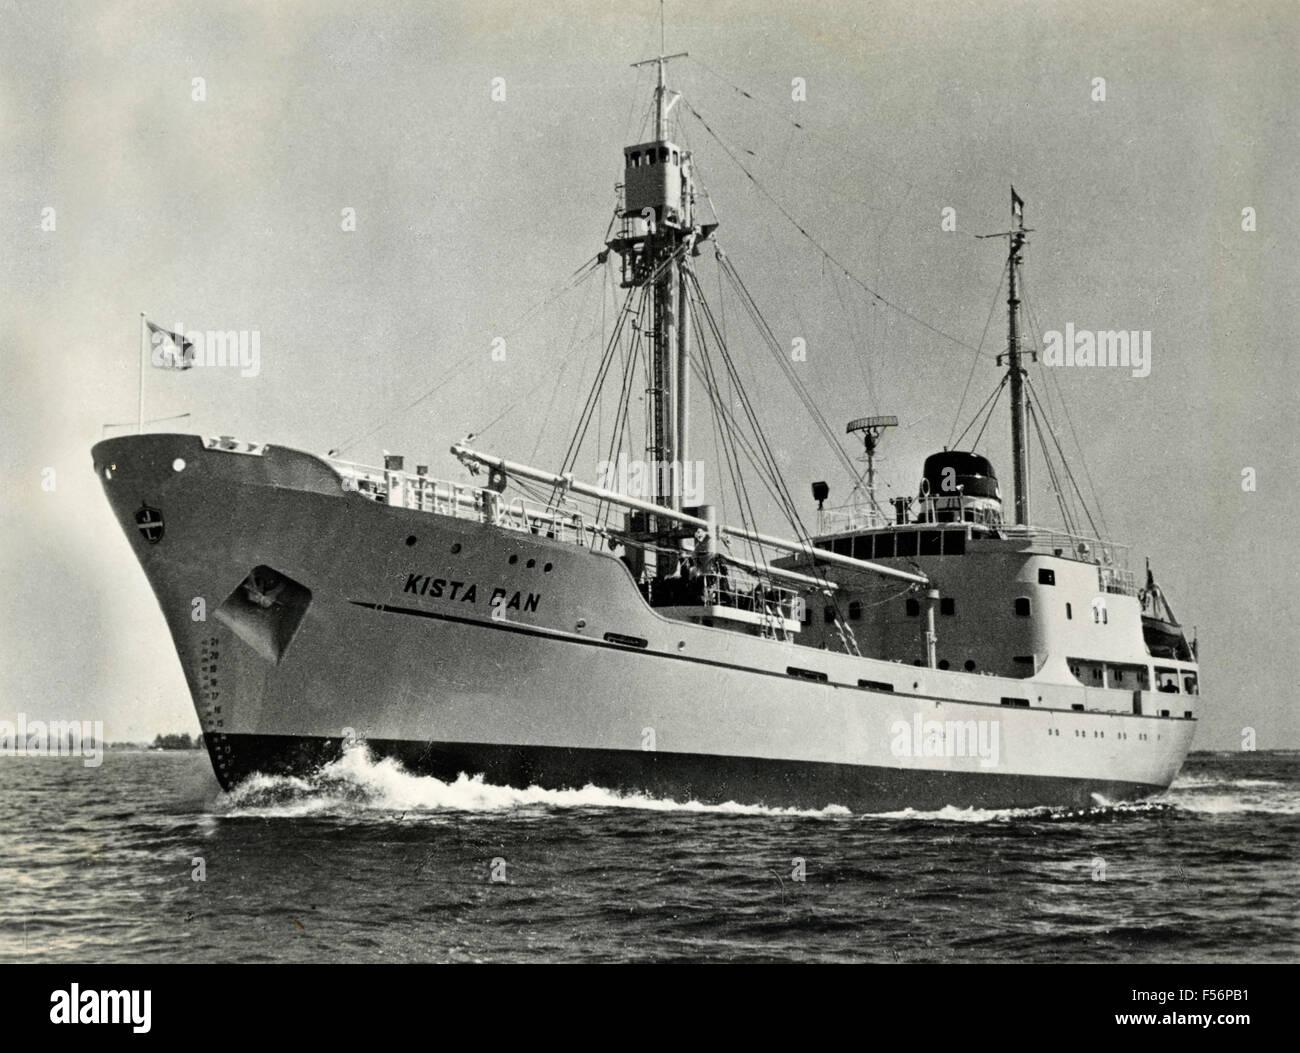 The polar ship Kista Dan - Stock Image